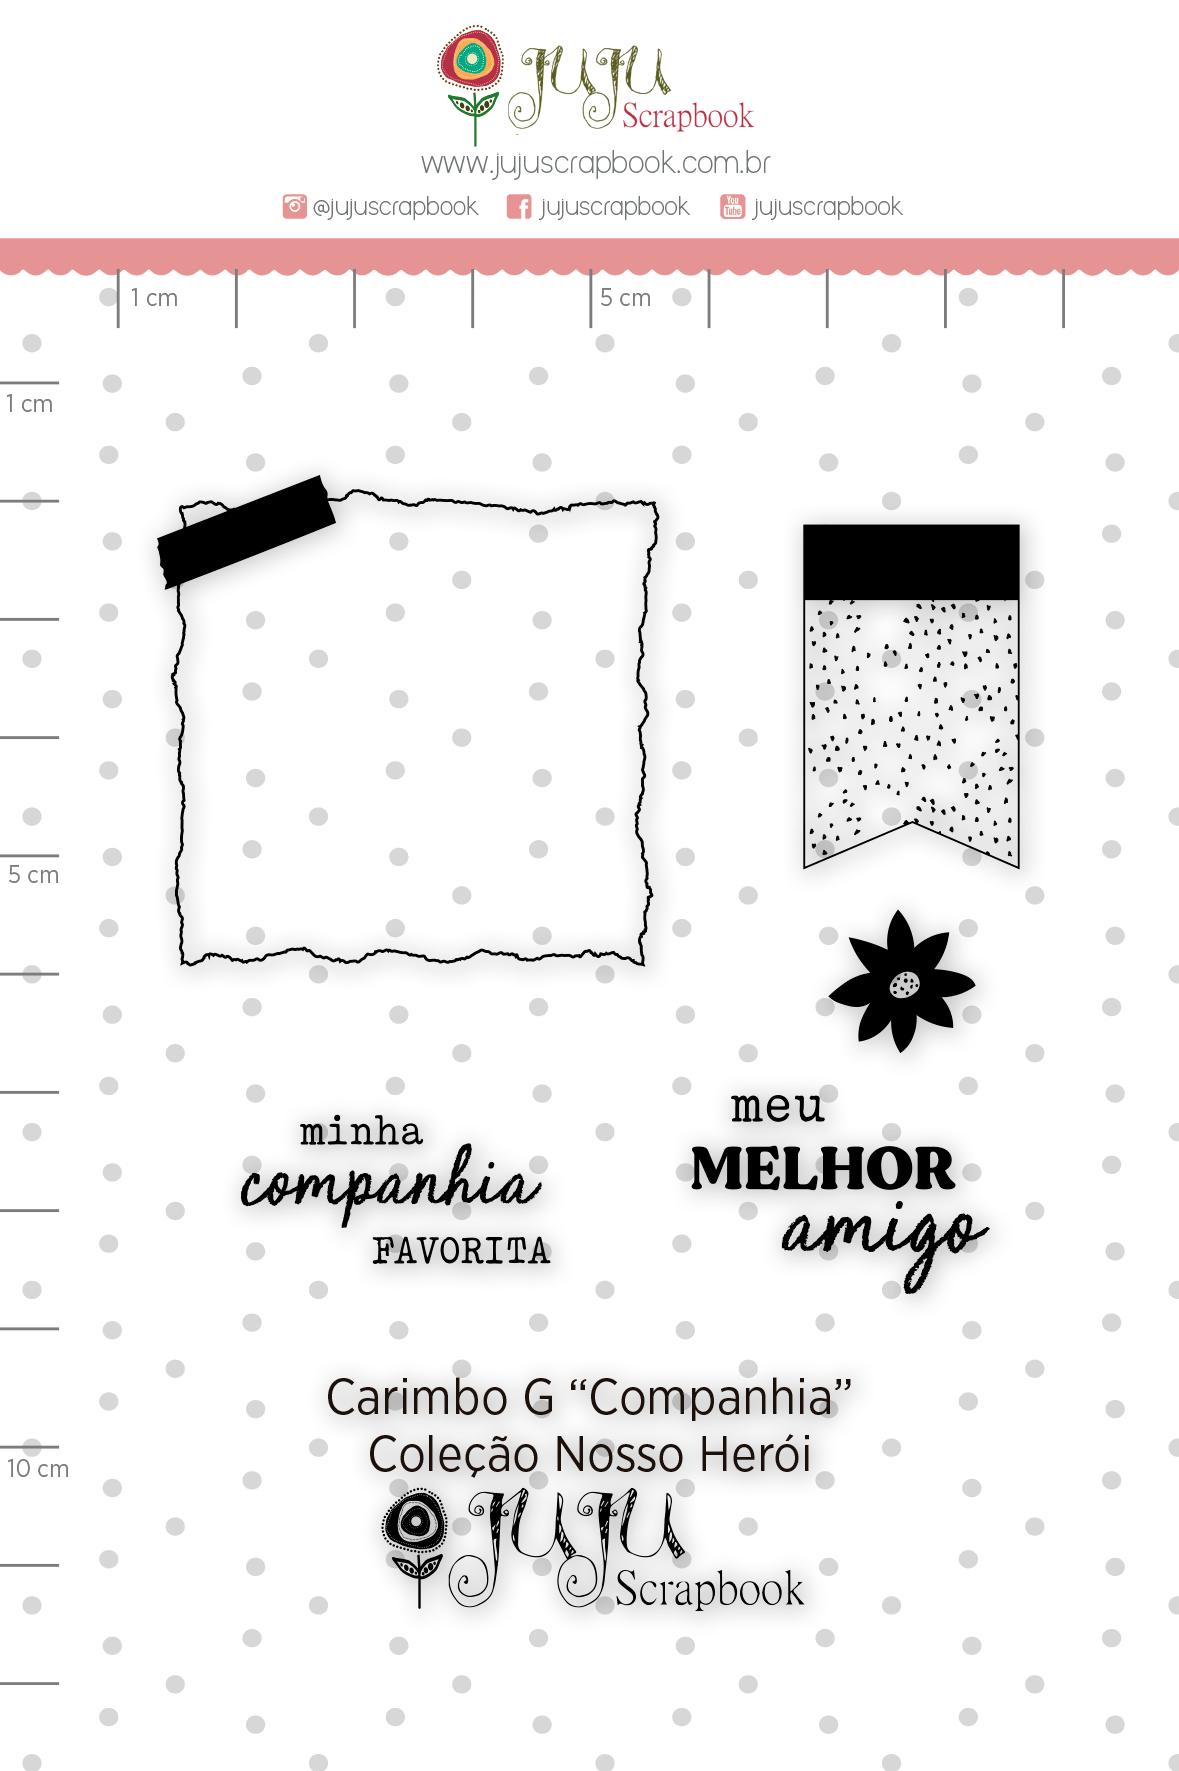 Carimbo G Companhia - Coleção Nosso Herói - JuJu Scrapbook  - JuJu Scrapbook